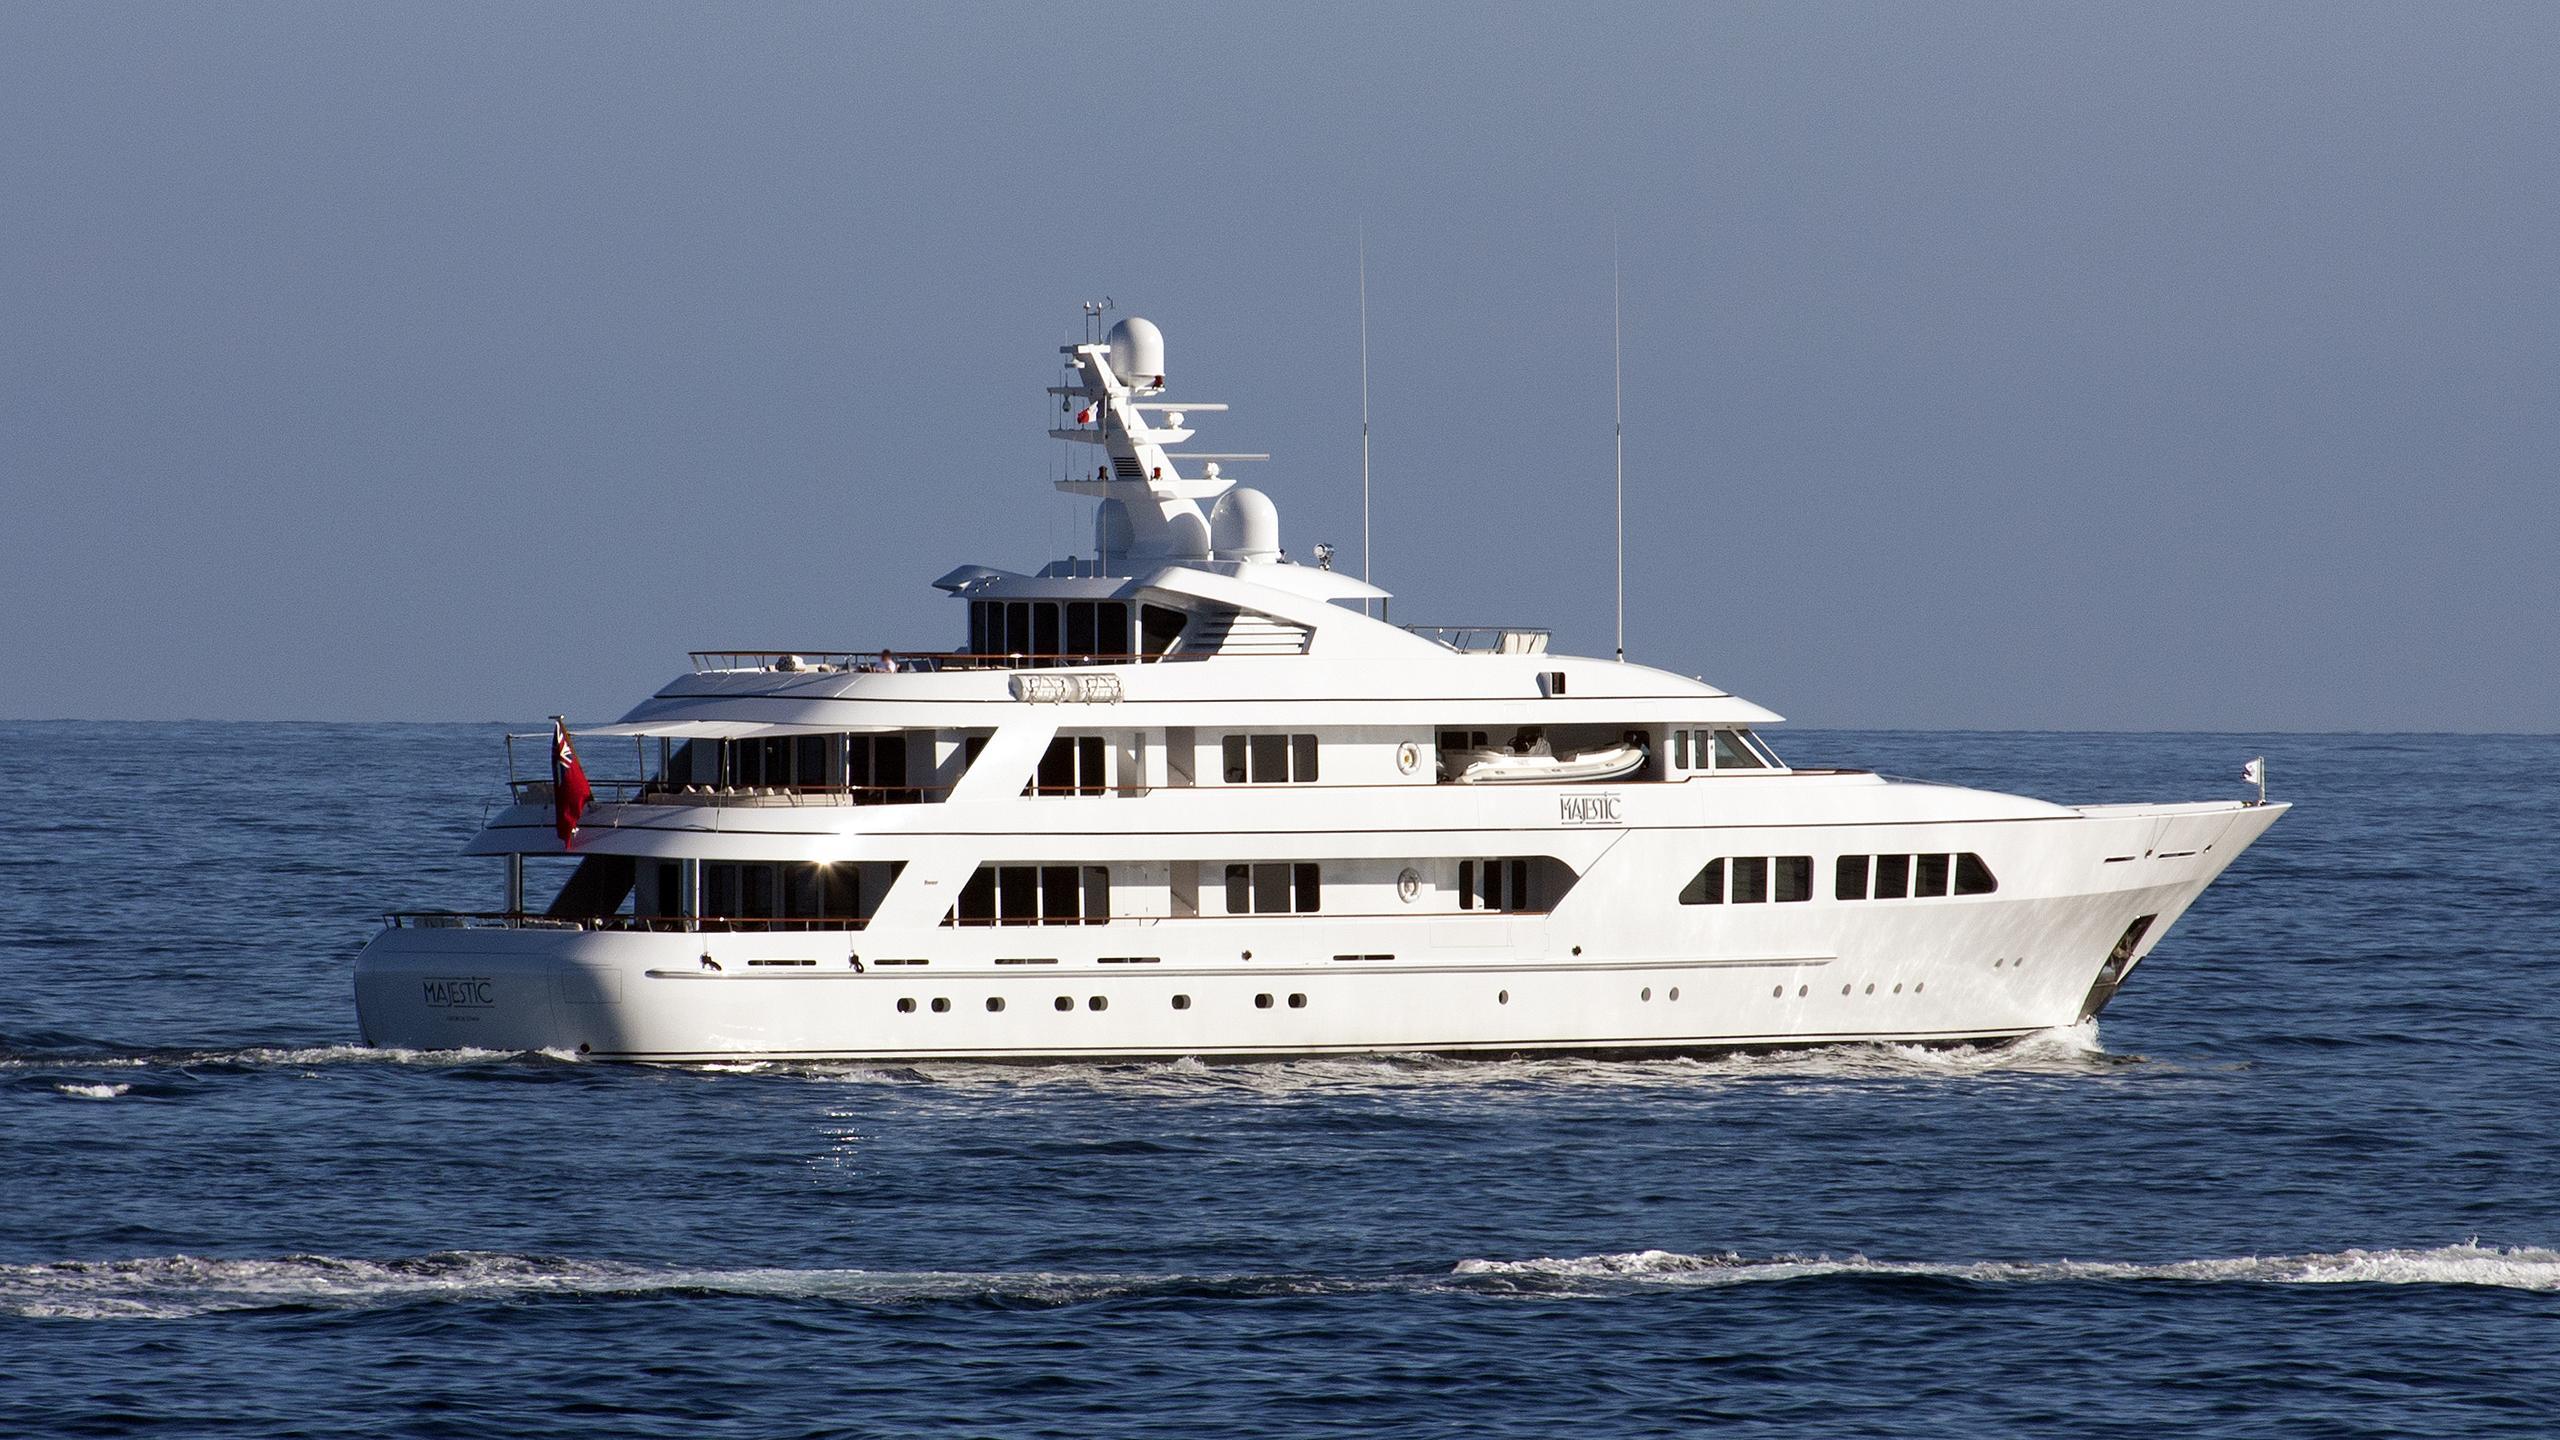 majestic-motor-yacht-feadship-2007-61m-half-profile-stern